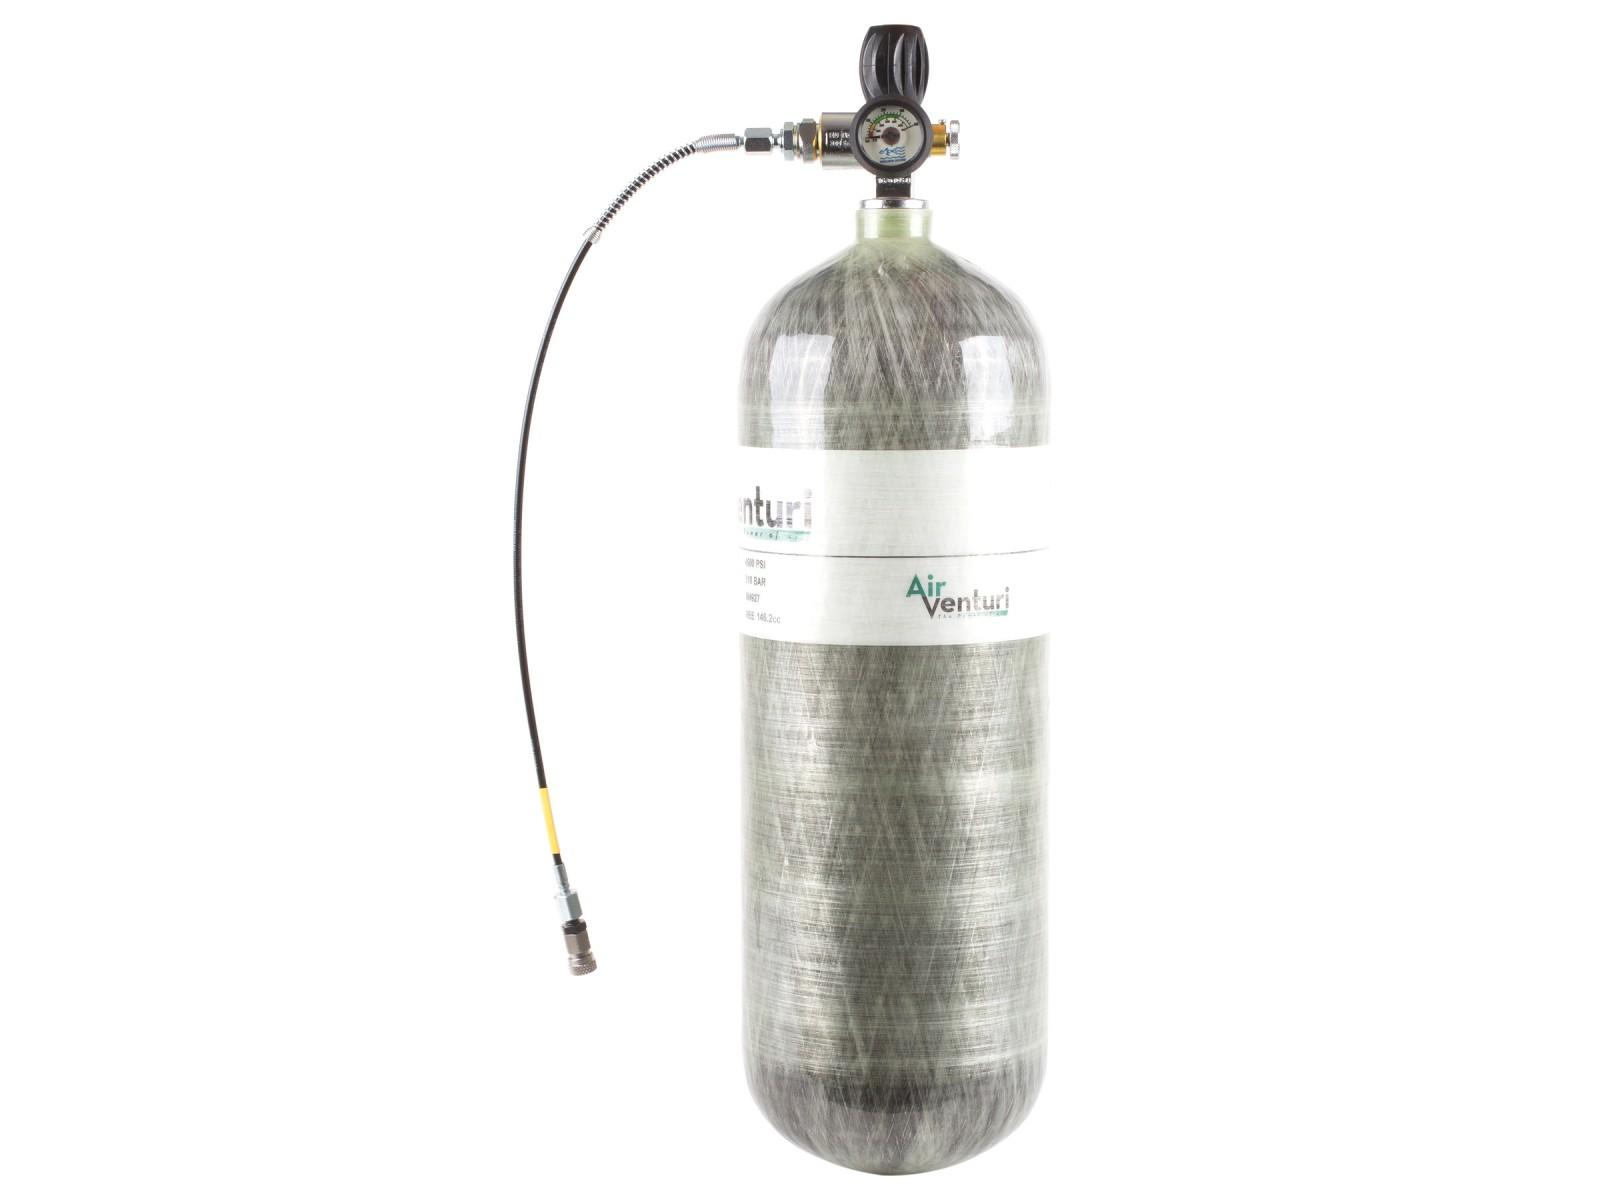 Air Venturi PCP tank, 4500 psi/300 bar, 98 cu ft